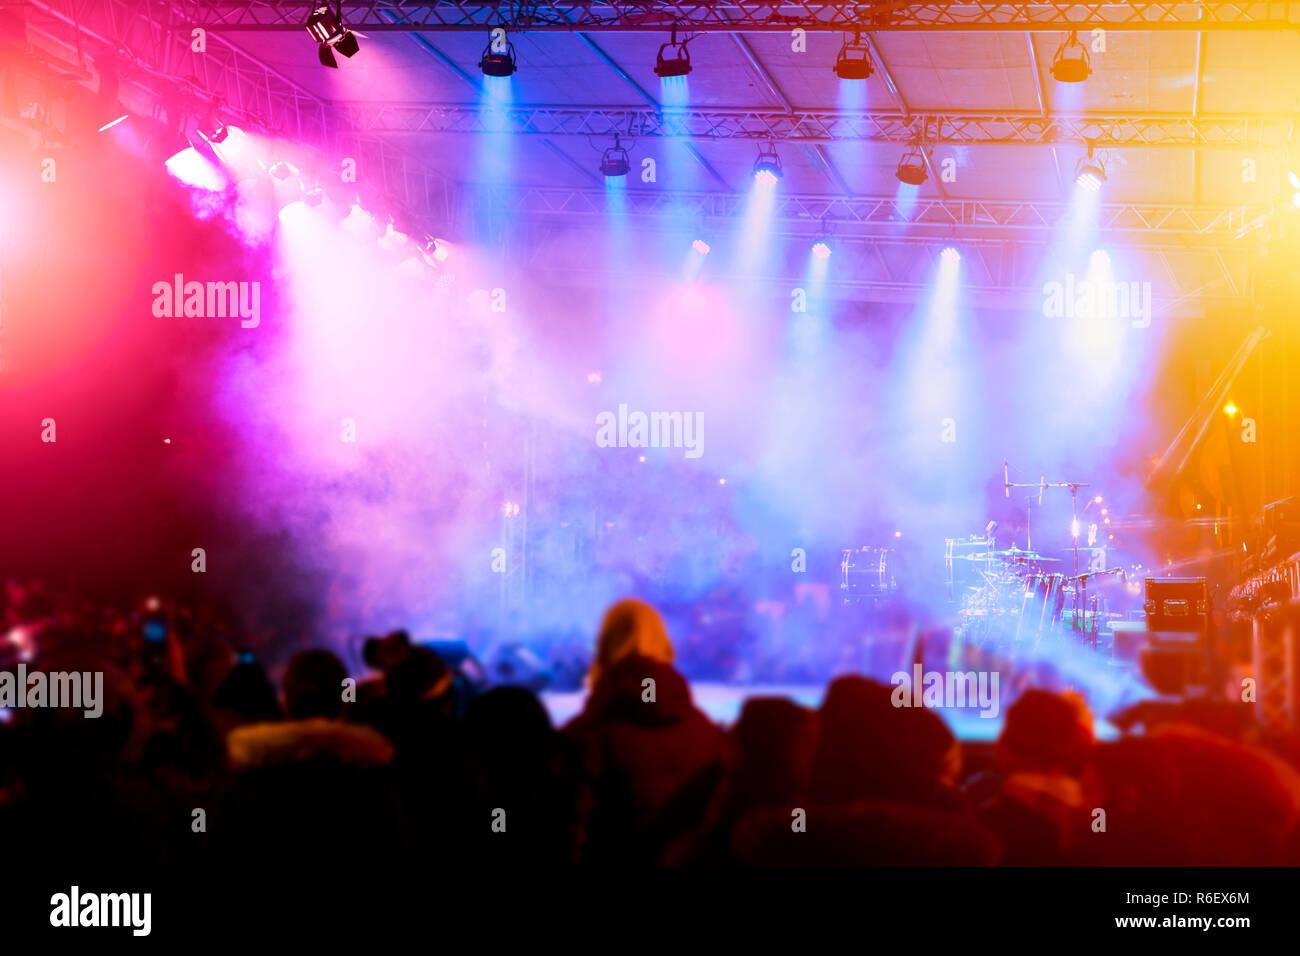 Defocused Entertainment Concert Lighting On Stage Entertainment